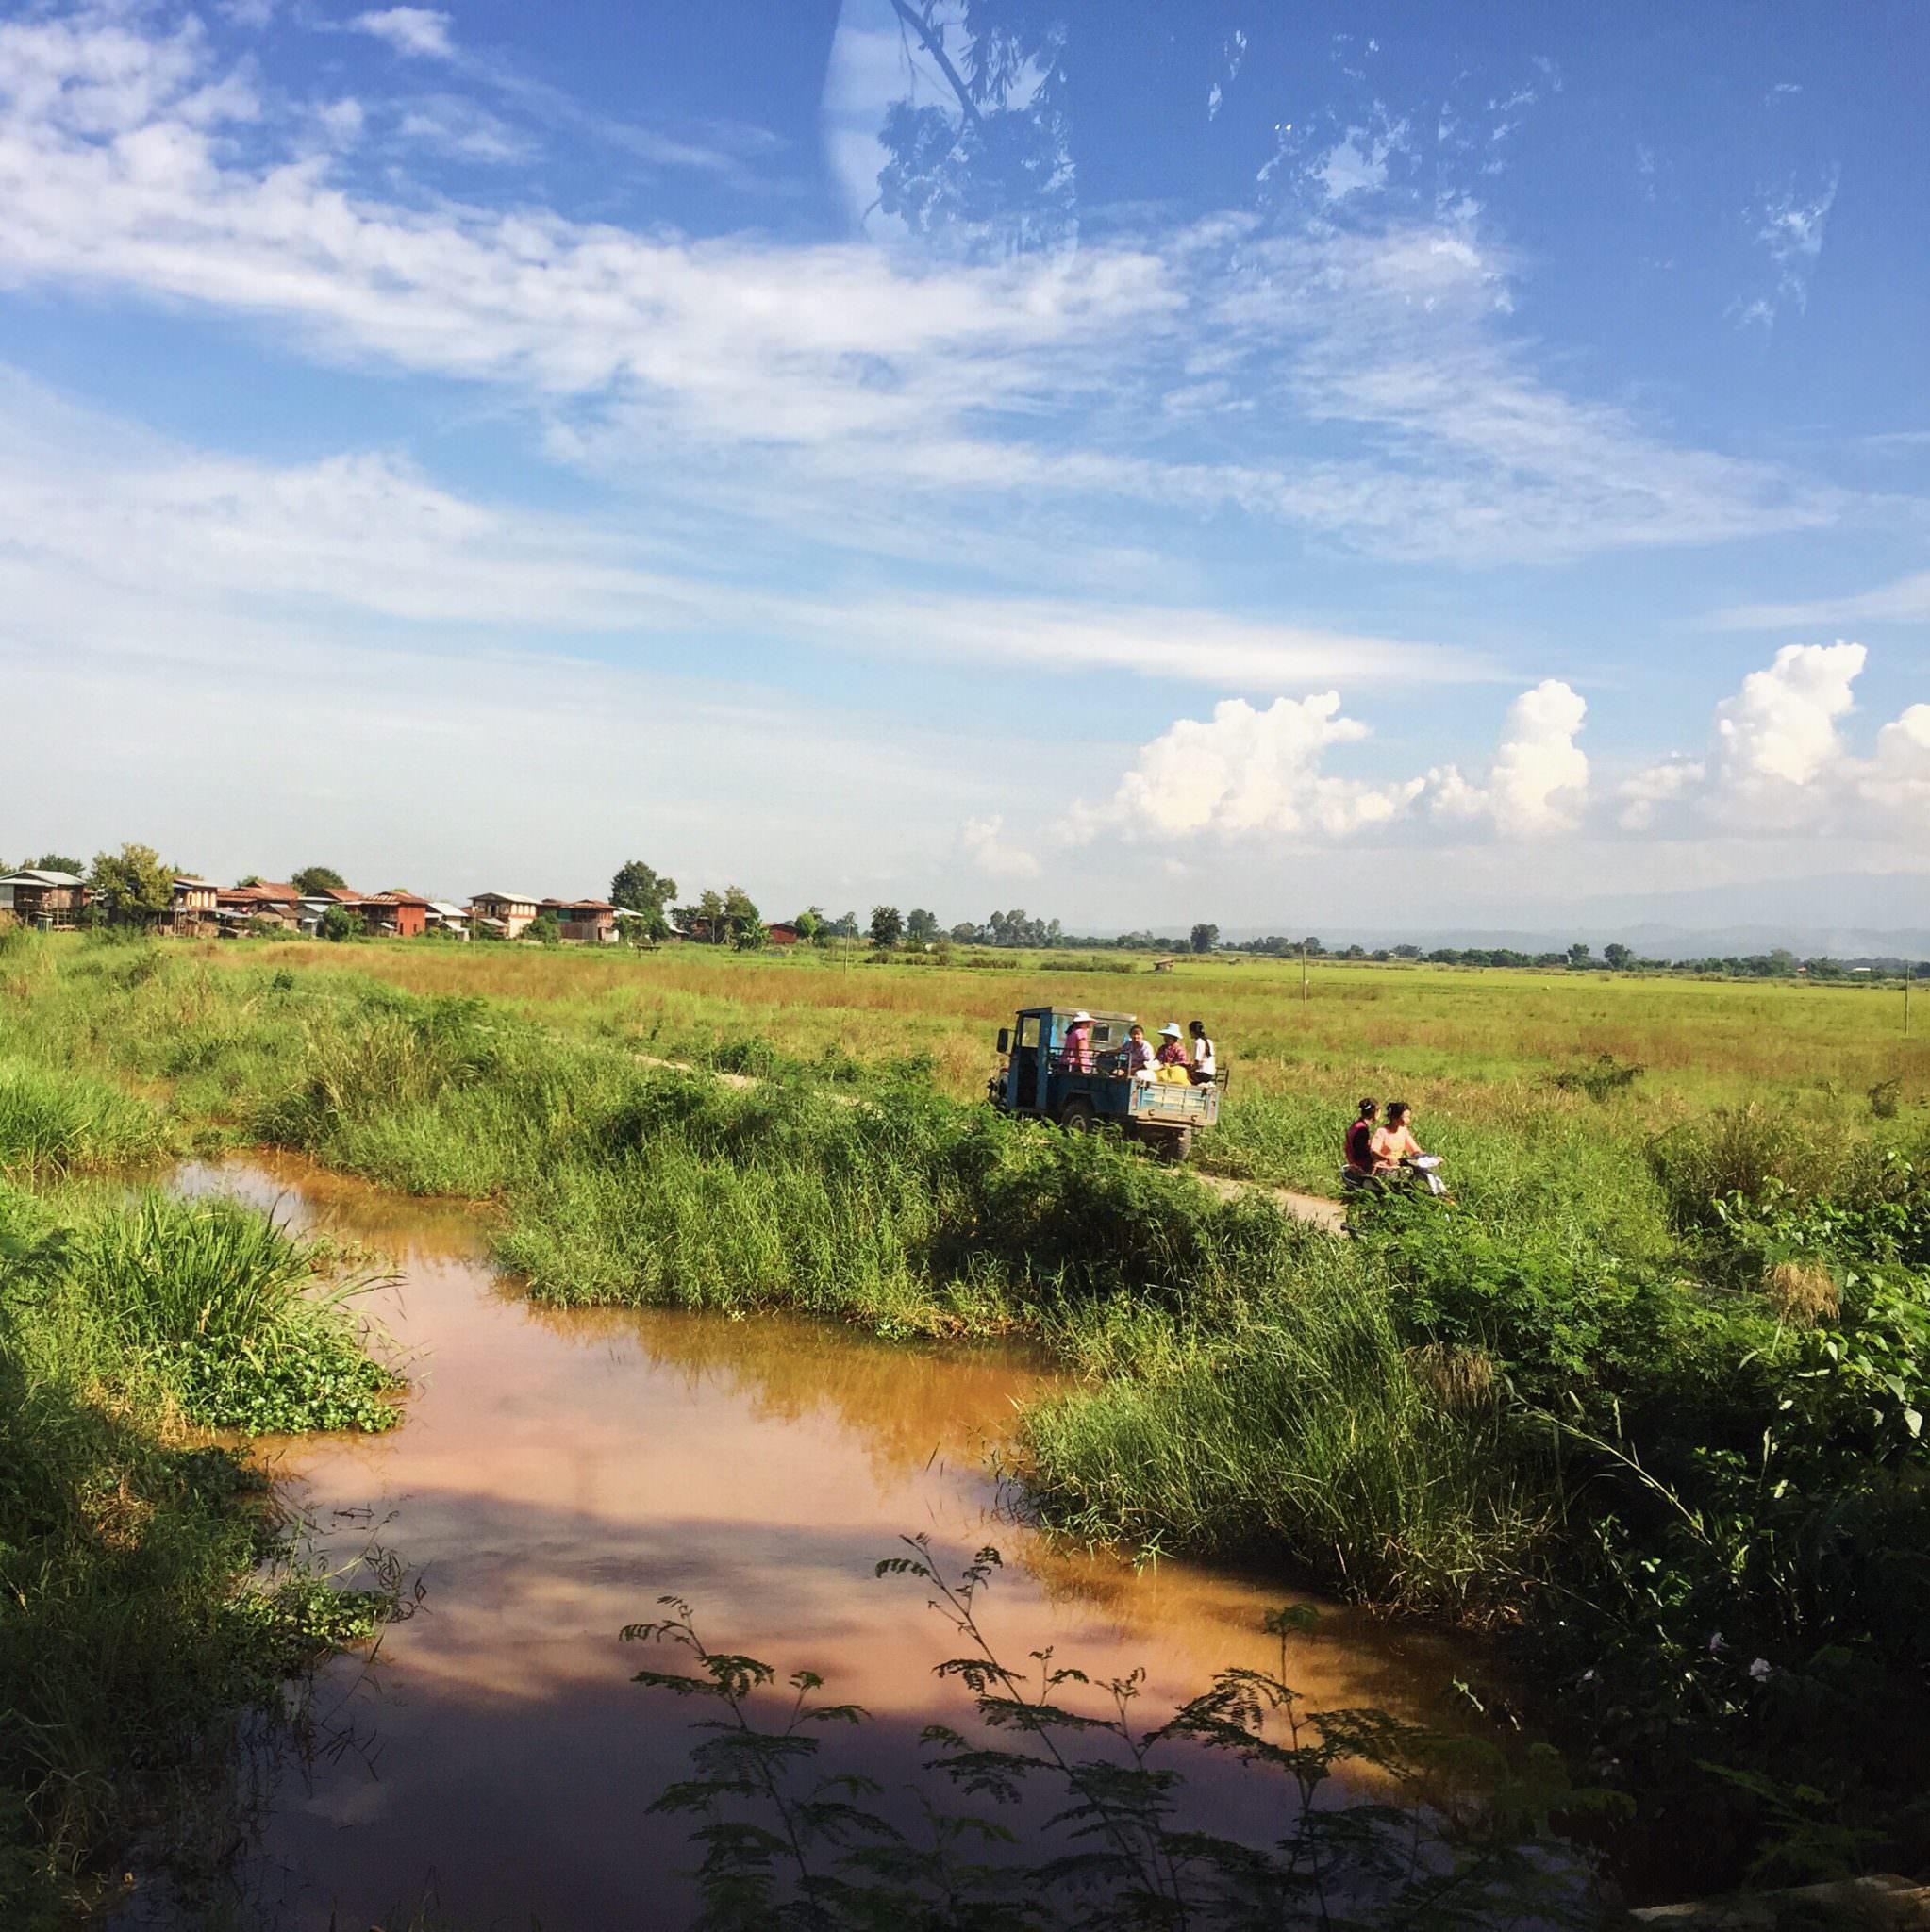 Burmese public transportation makes its way through the countryside. © 2015 Gail Jessen